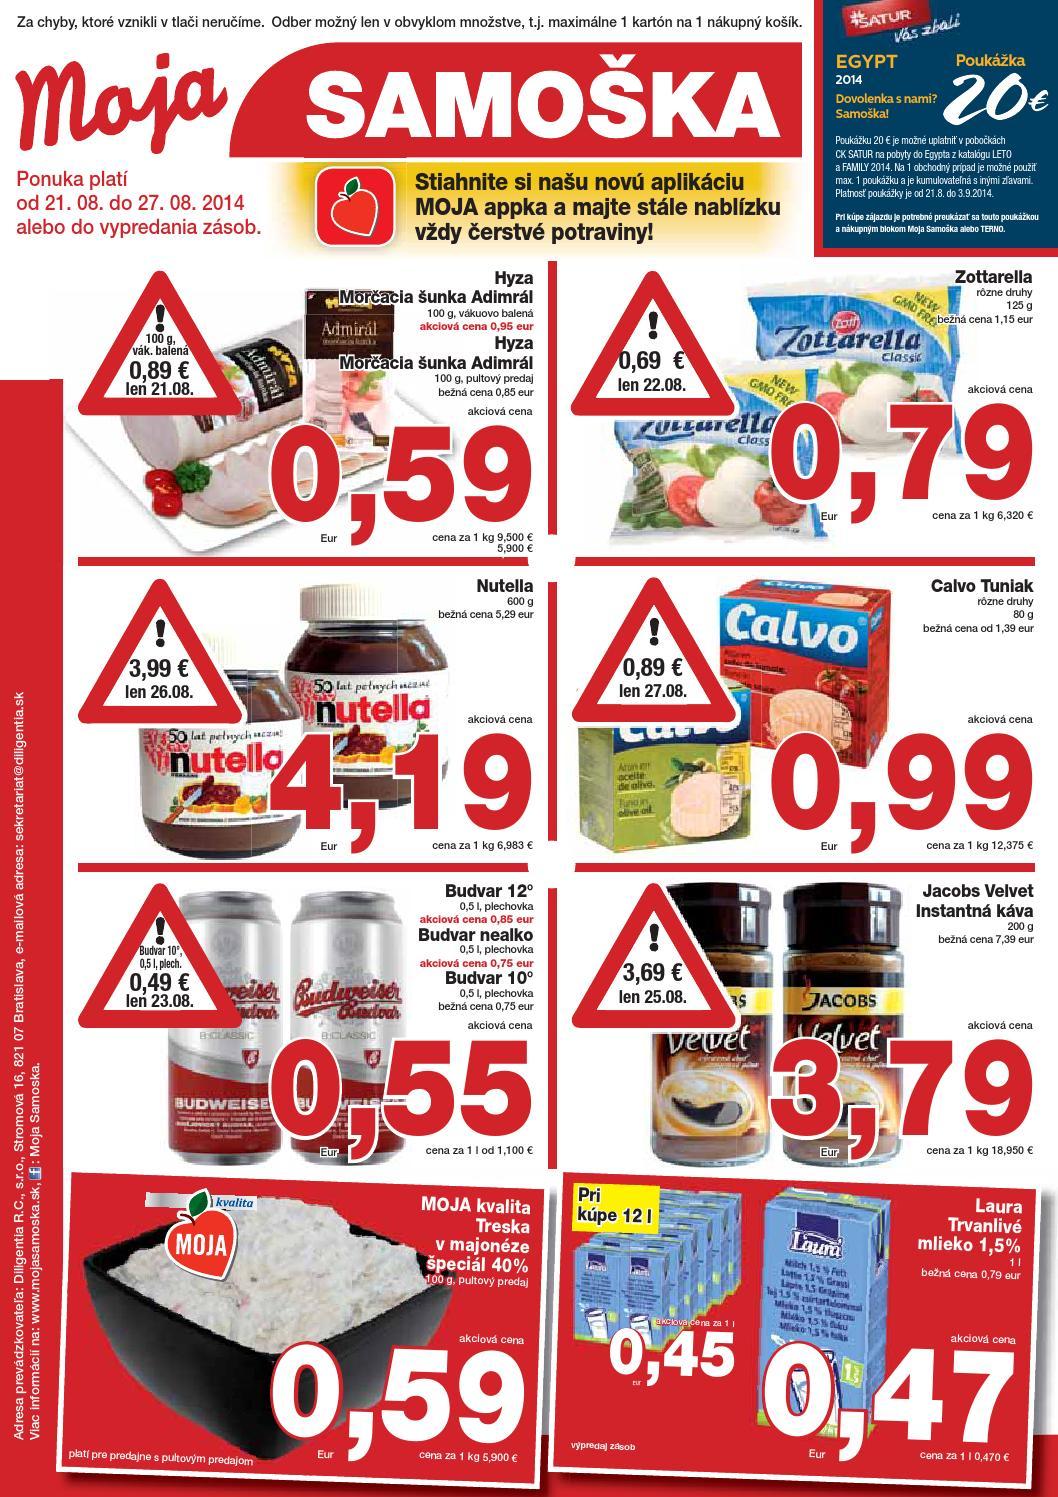 34 letak samoska 2014 by triad advertising - issuu 67663e549e3